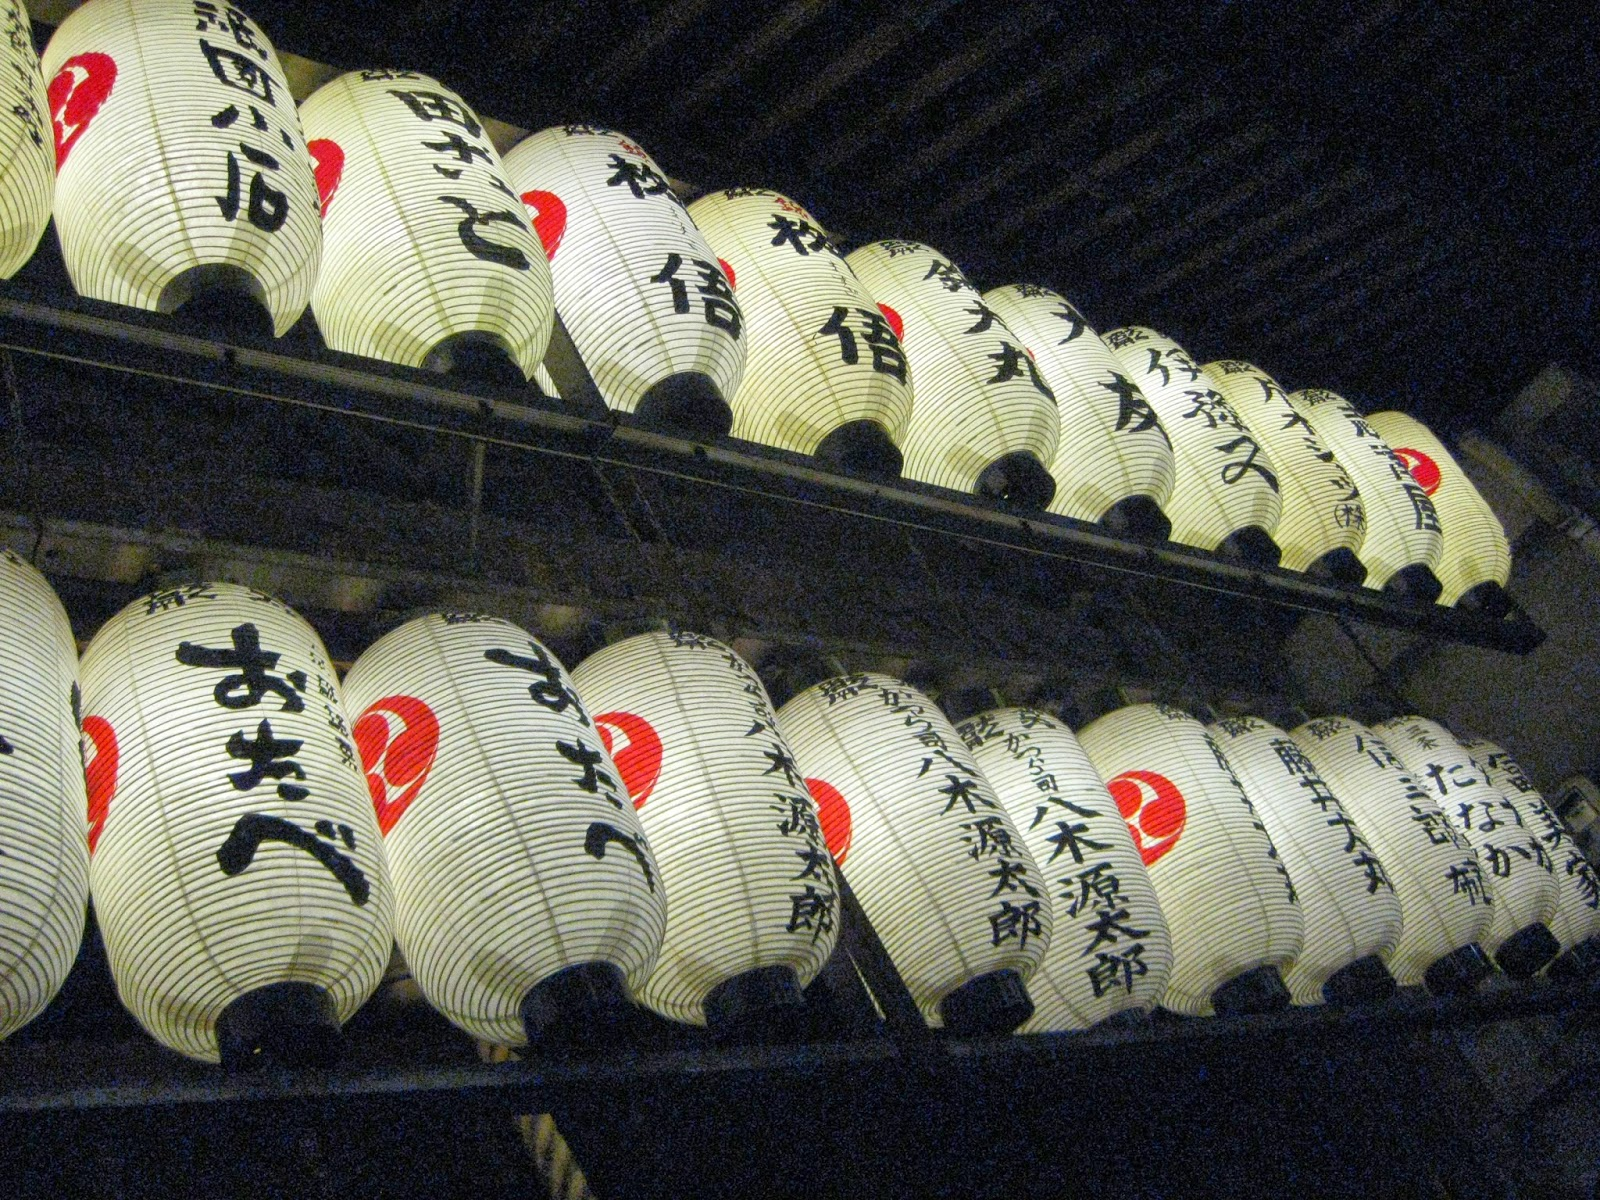 Kyoto - Beautiful lanterns line the street